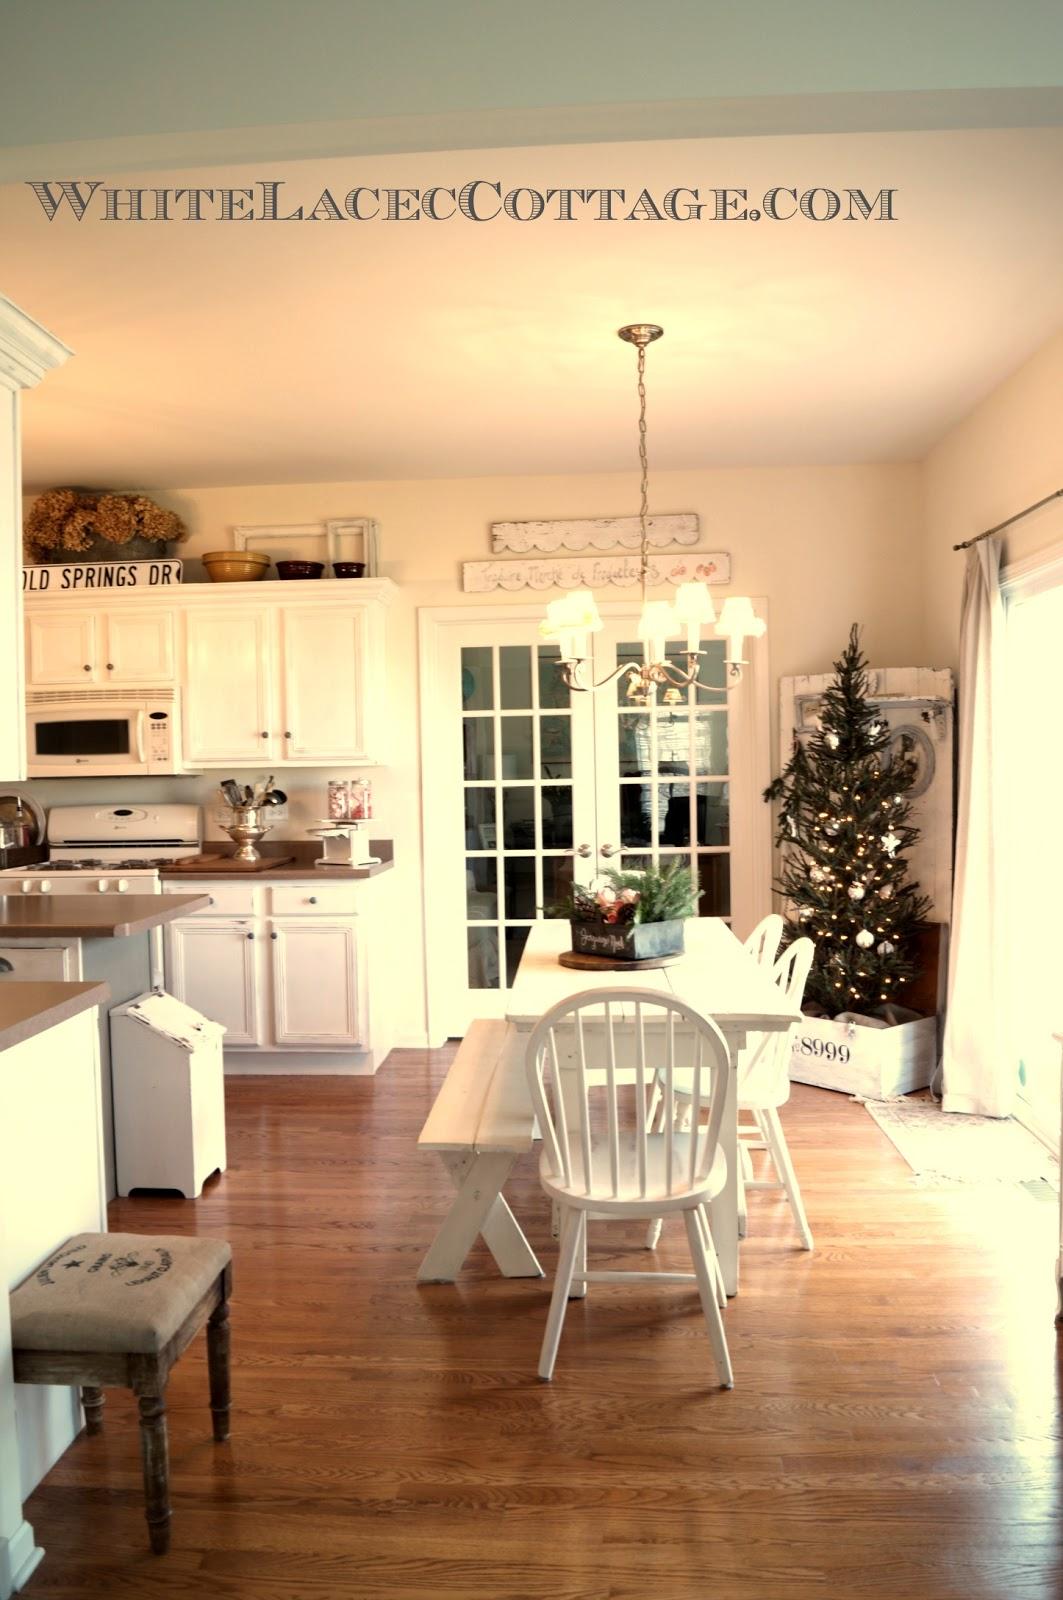 M Kitchen Decor Home Decorating Ideas